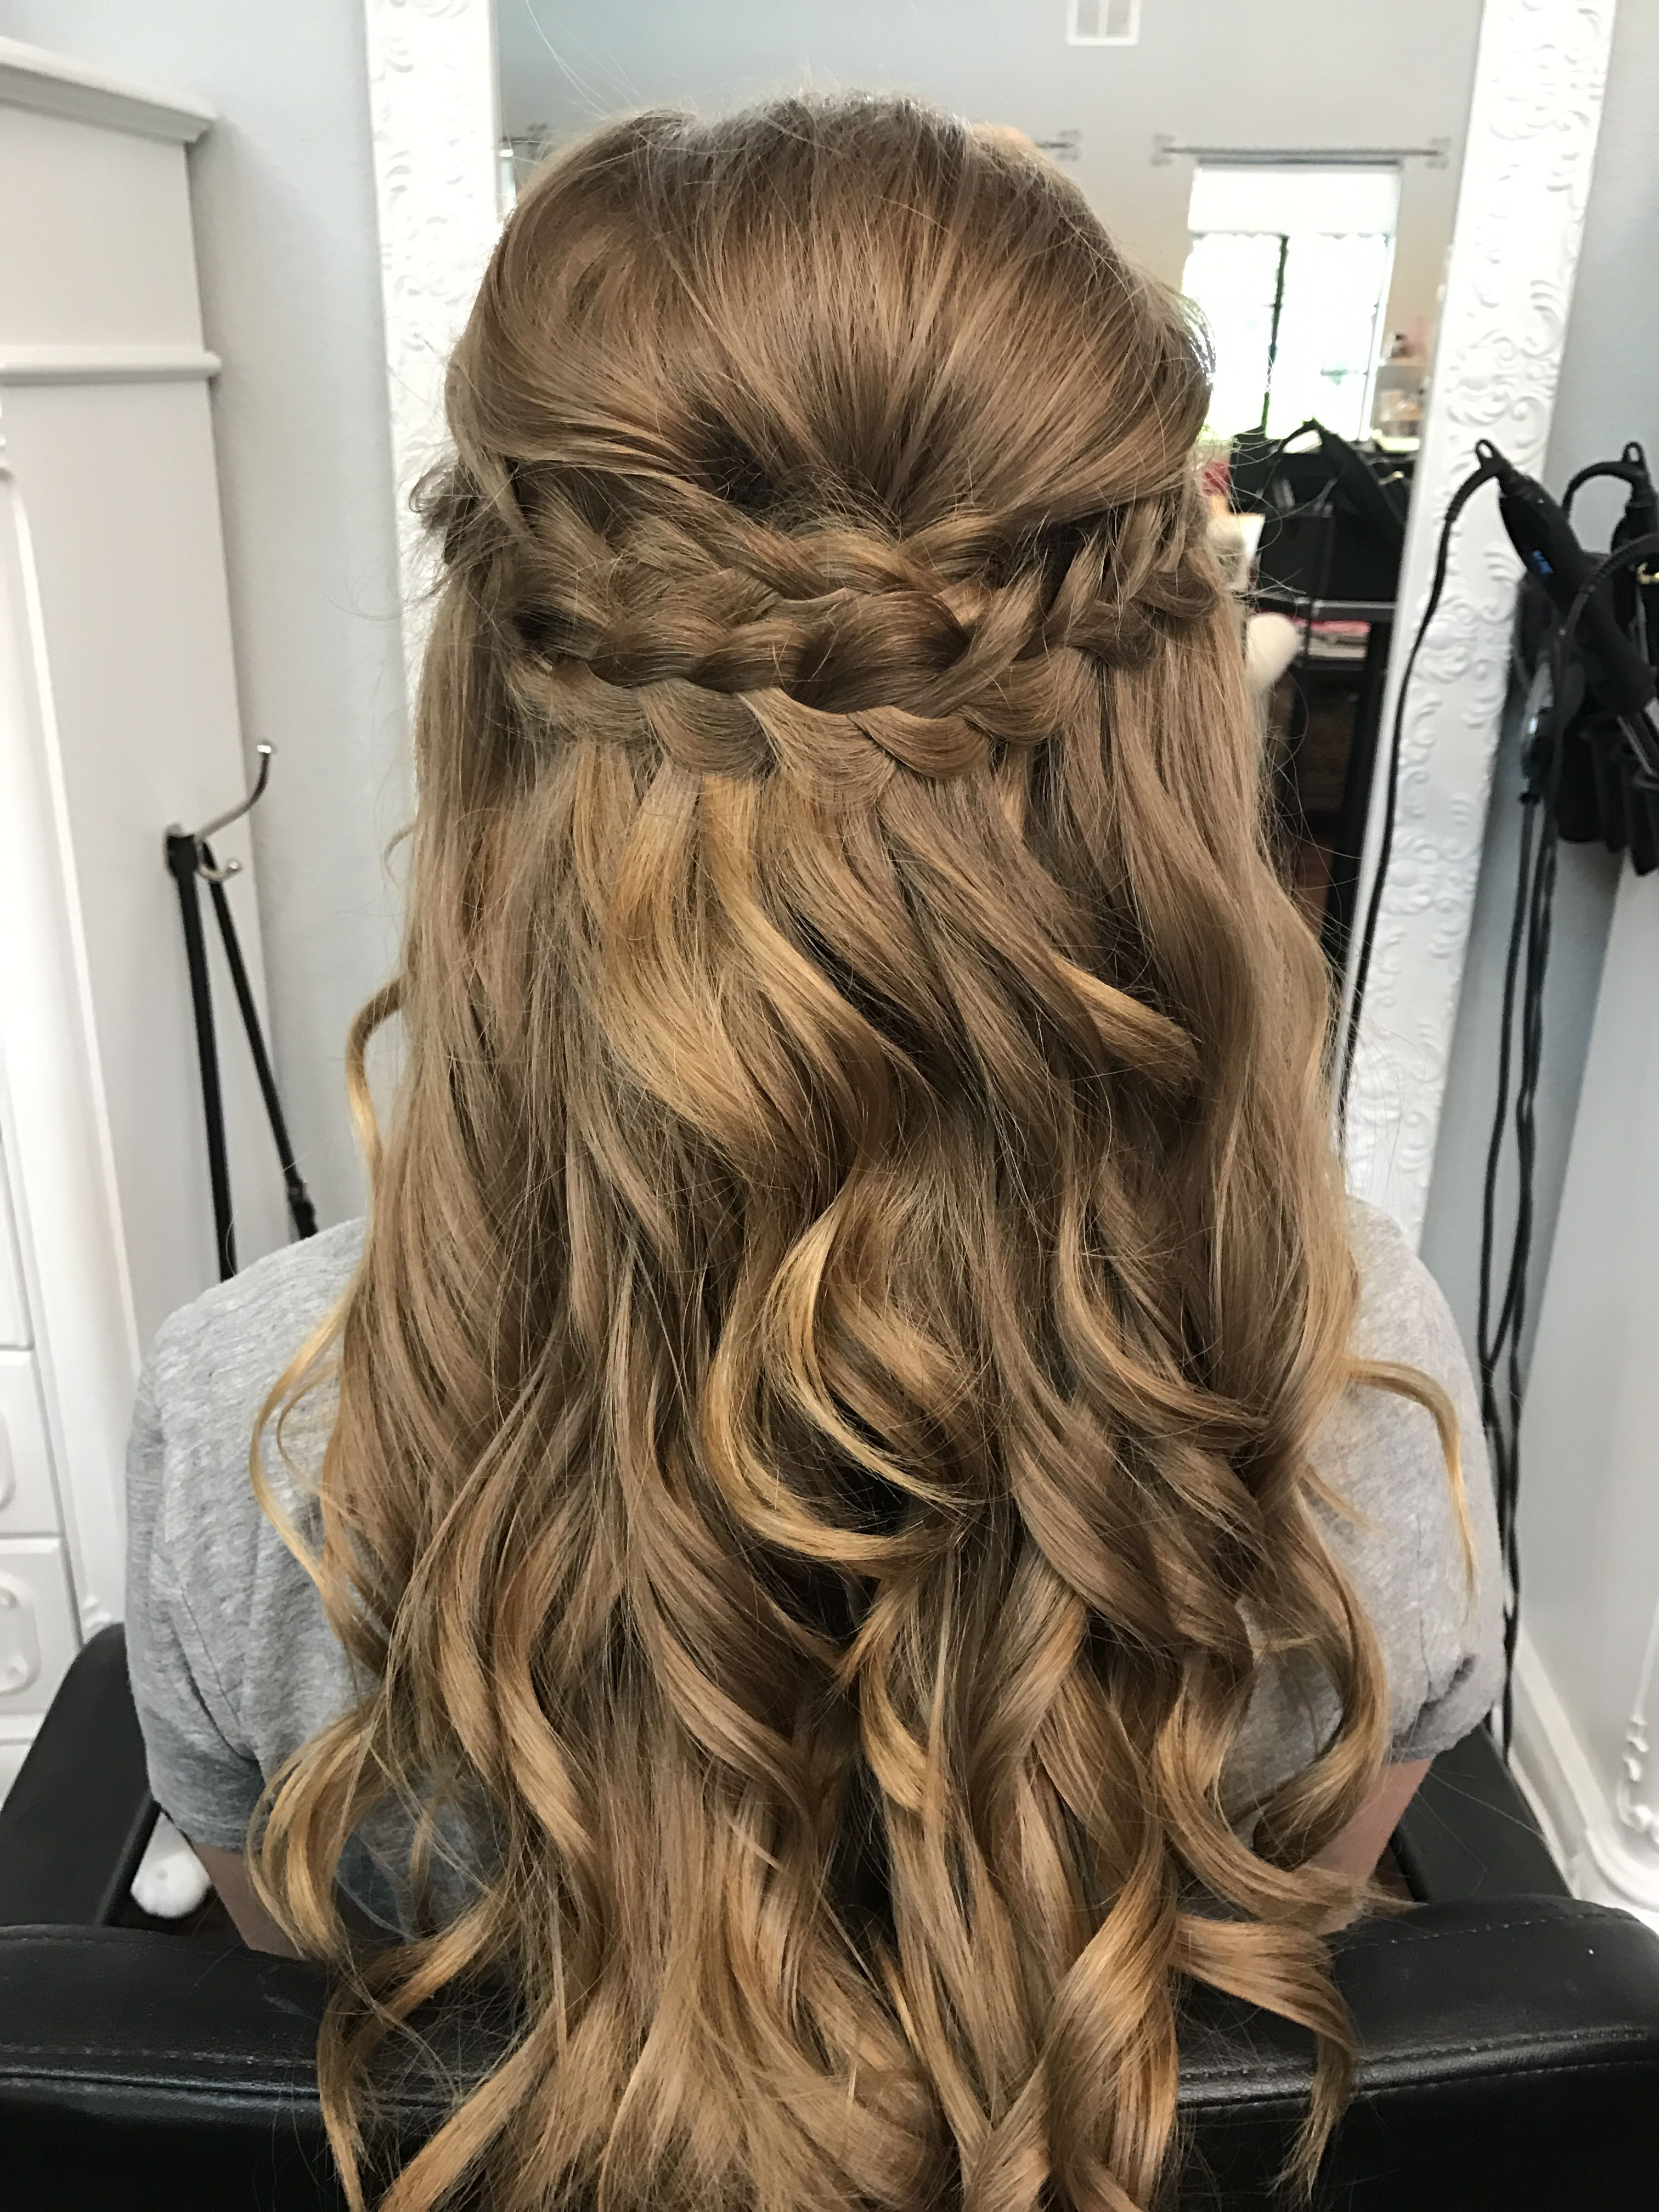 Prom Hair Half Up Half Down Straight | ImagesBench